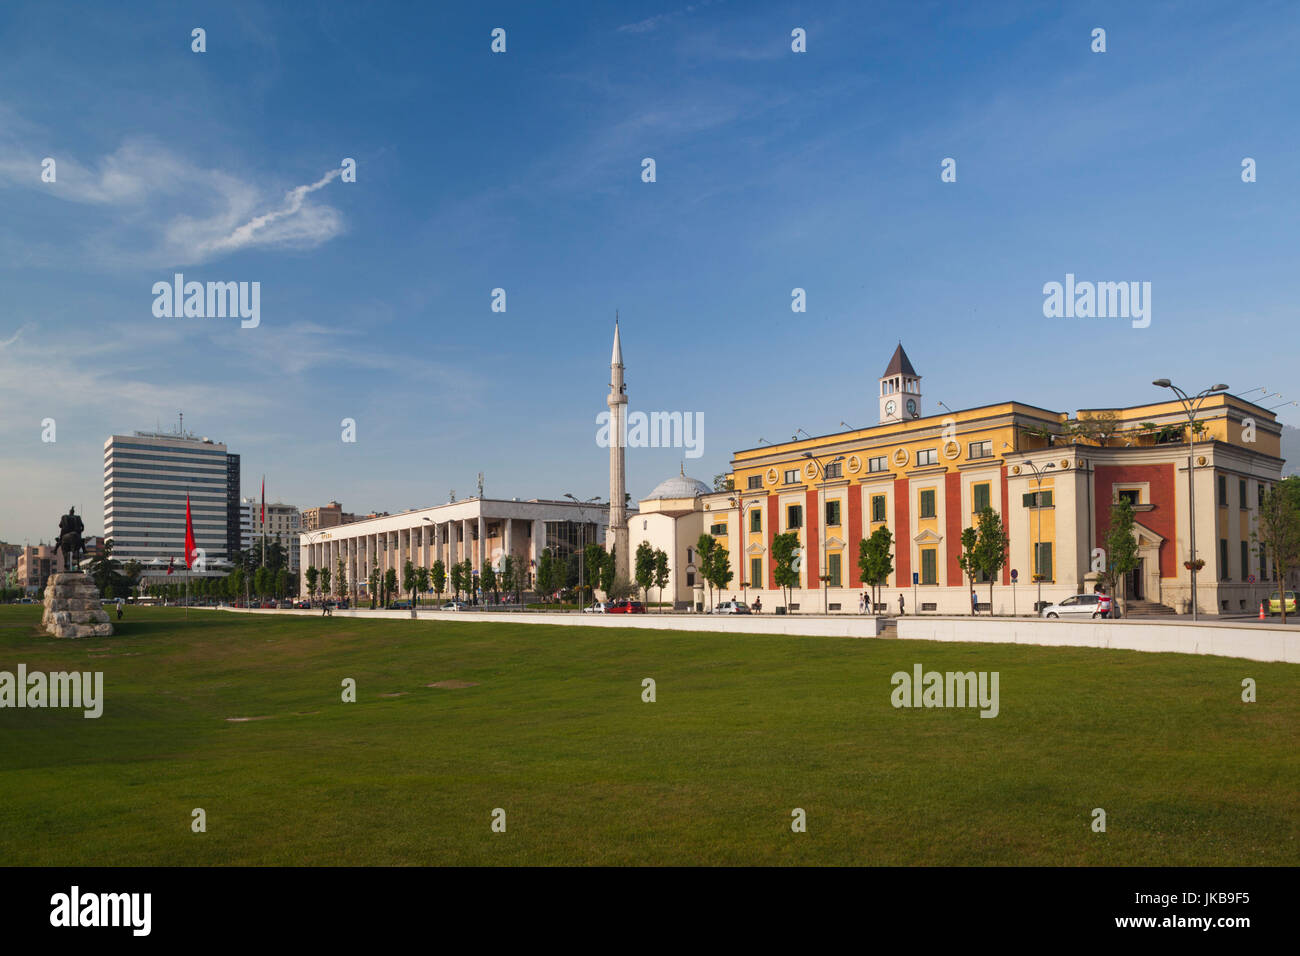 Albania, Tirana, Skanderbeg Square, buildings - Stock Image